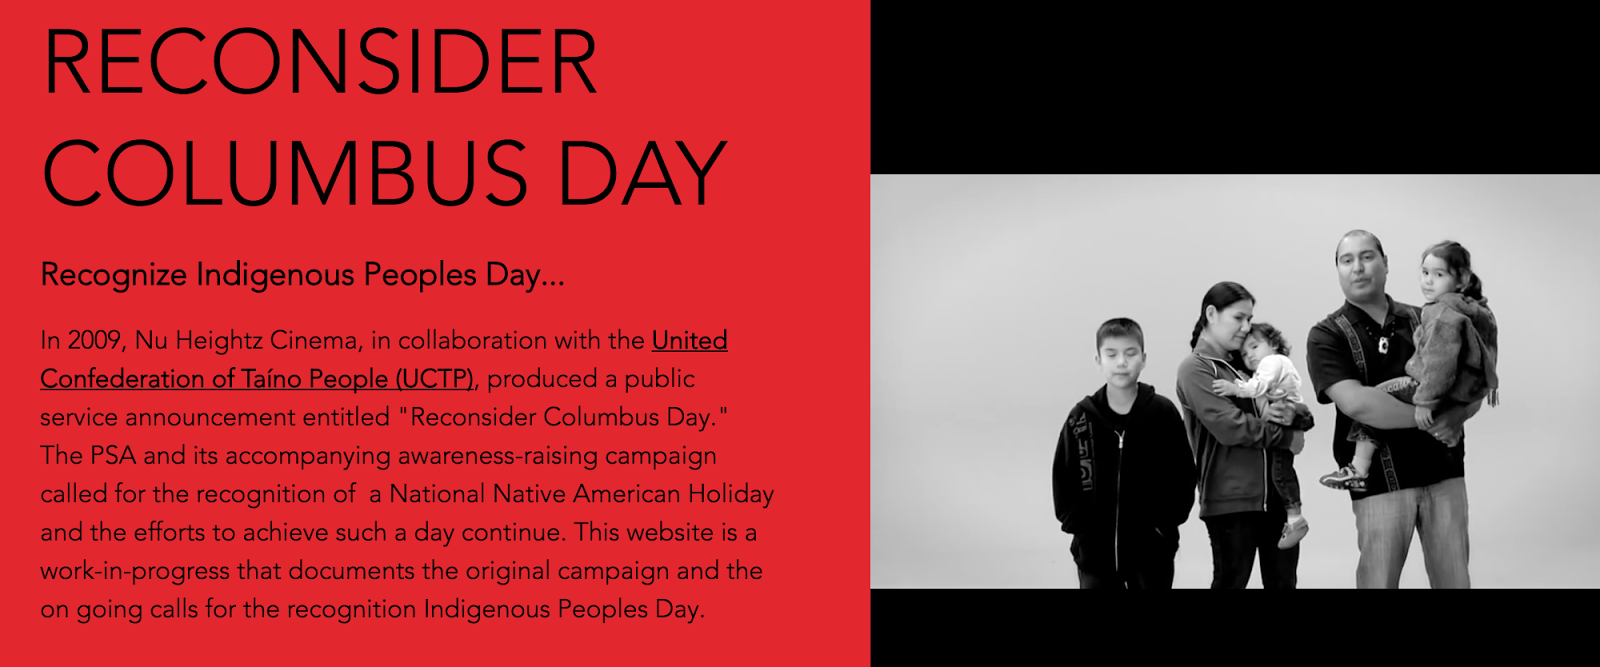 reconsider columbus day